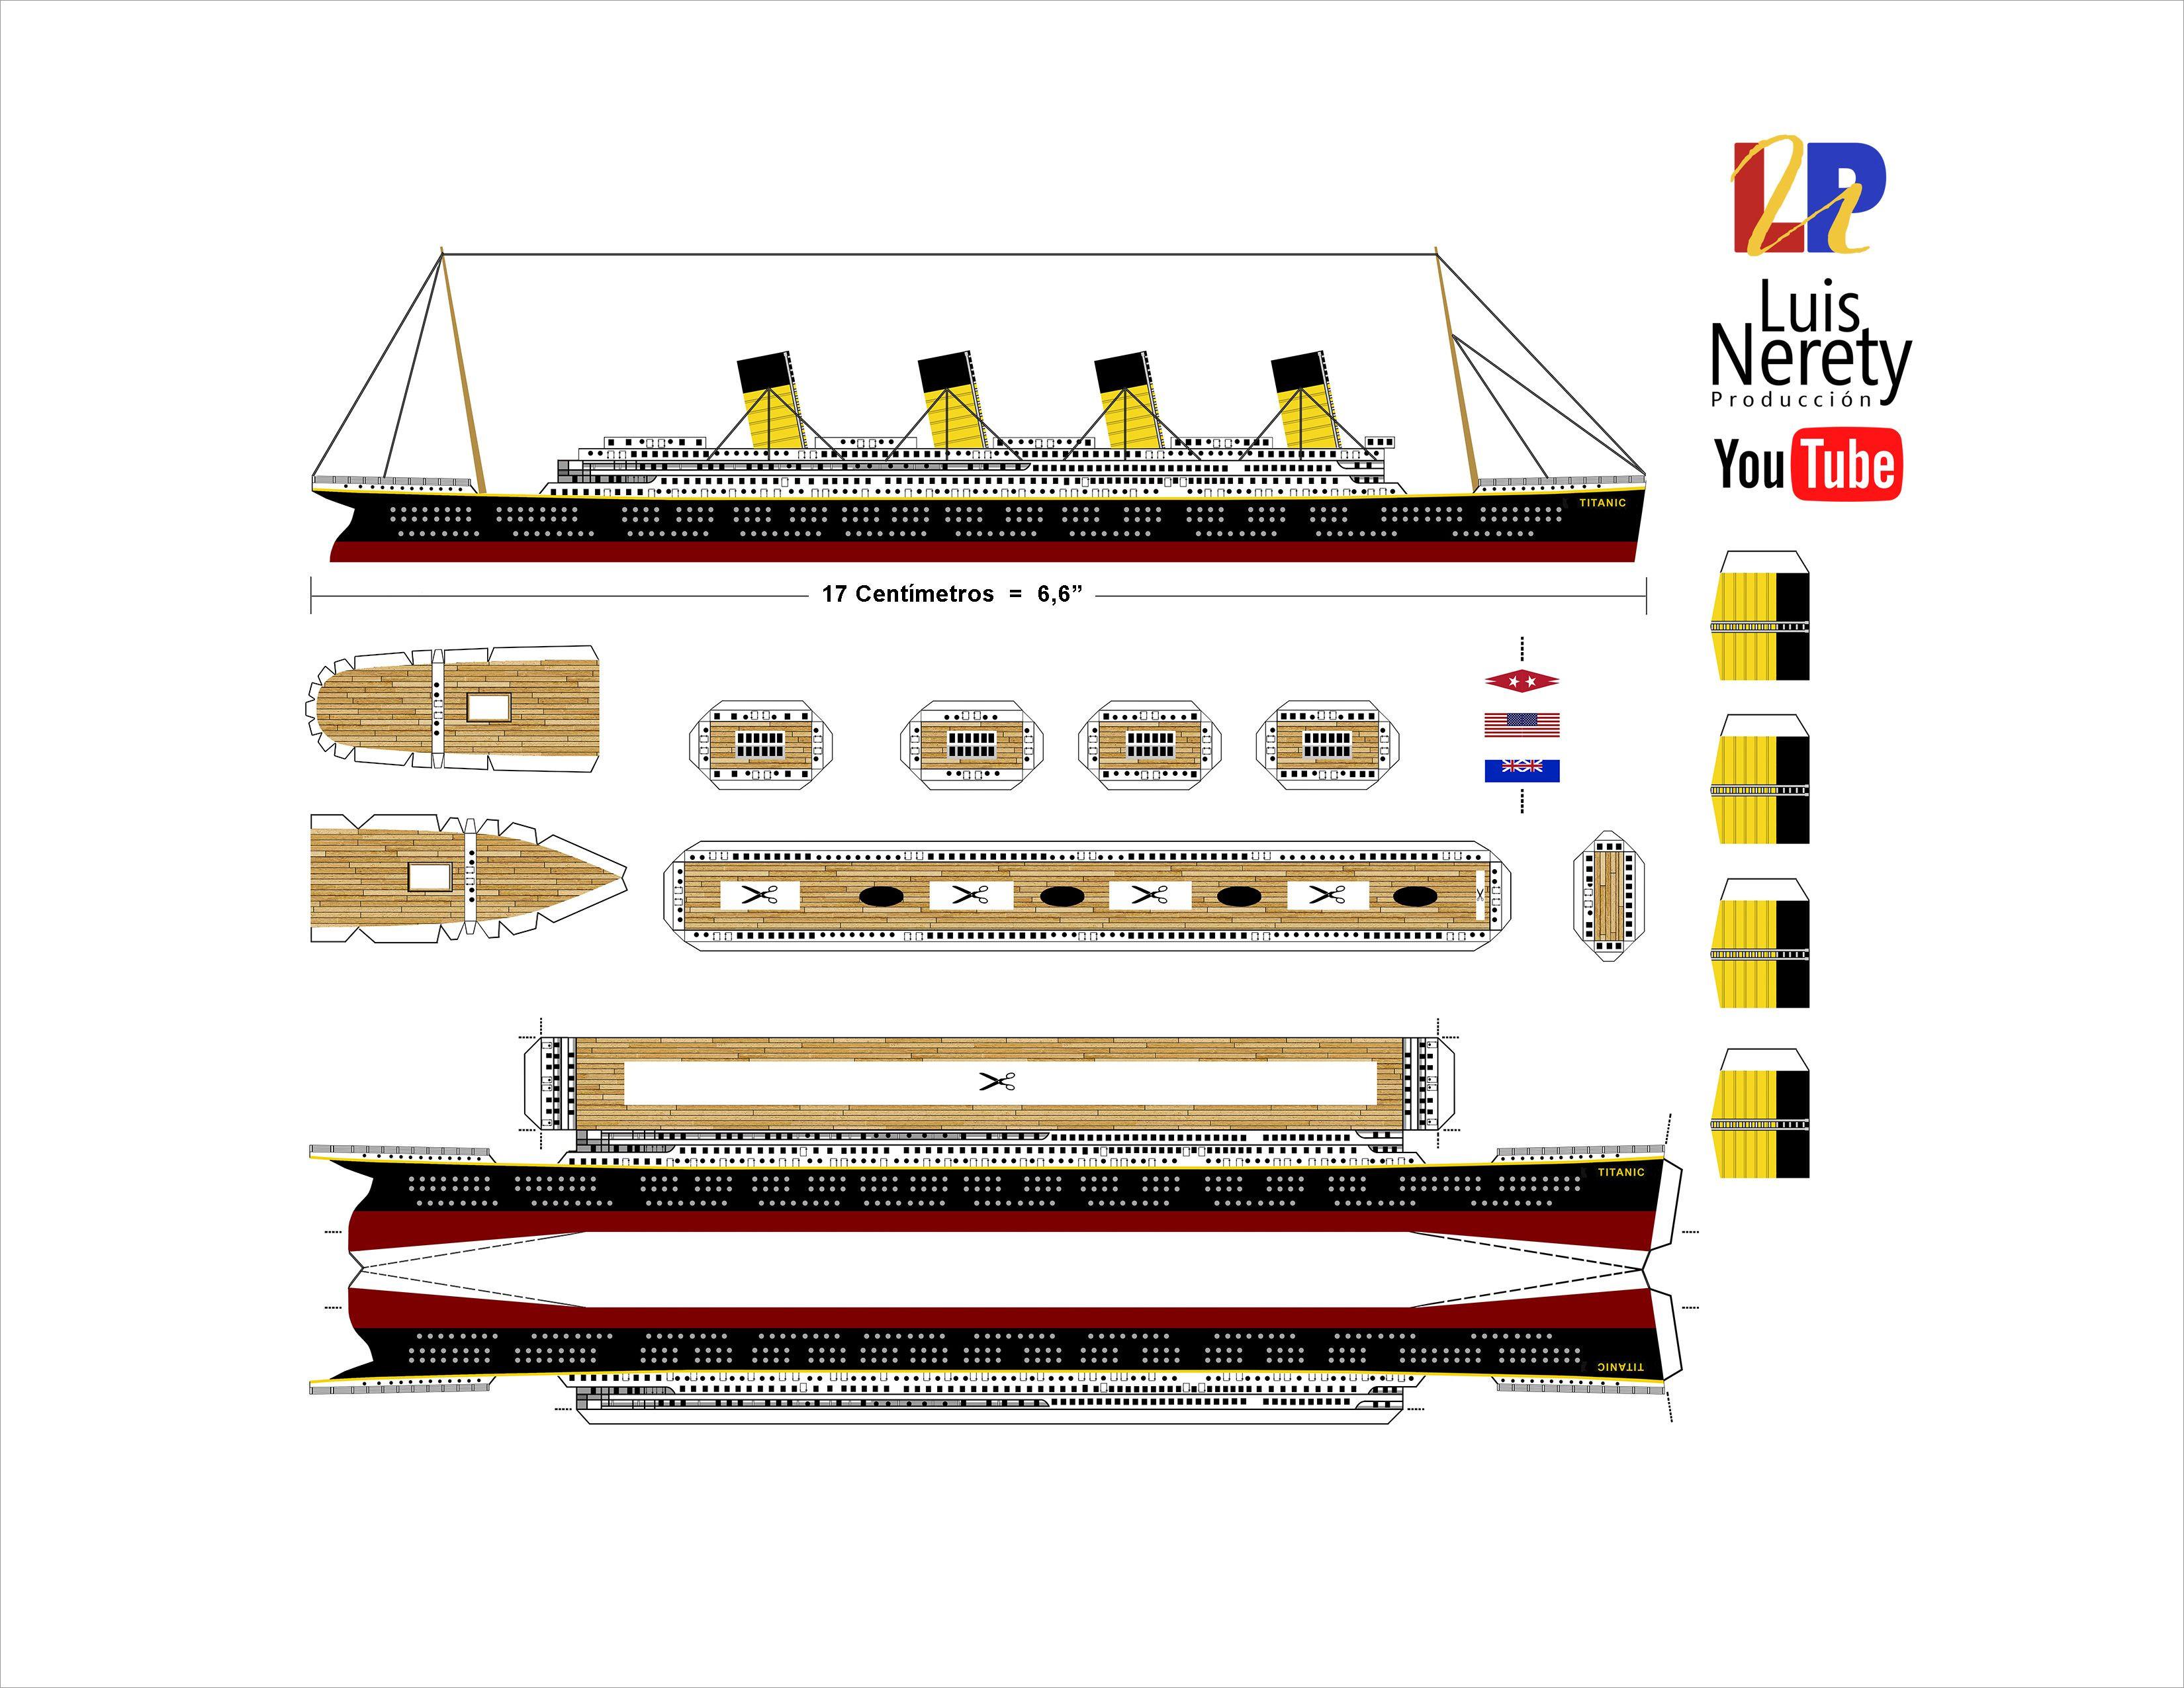 Titanic Papercraft Titanic Papercraft Template Download